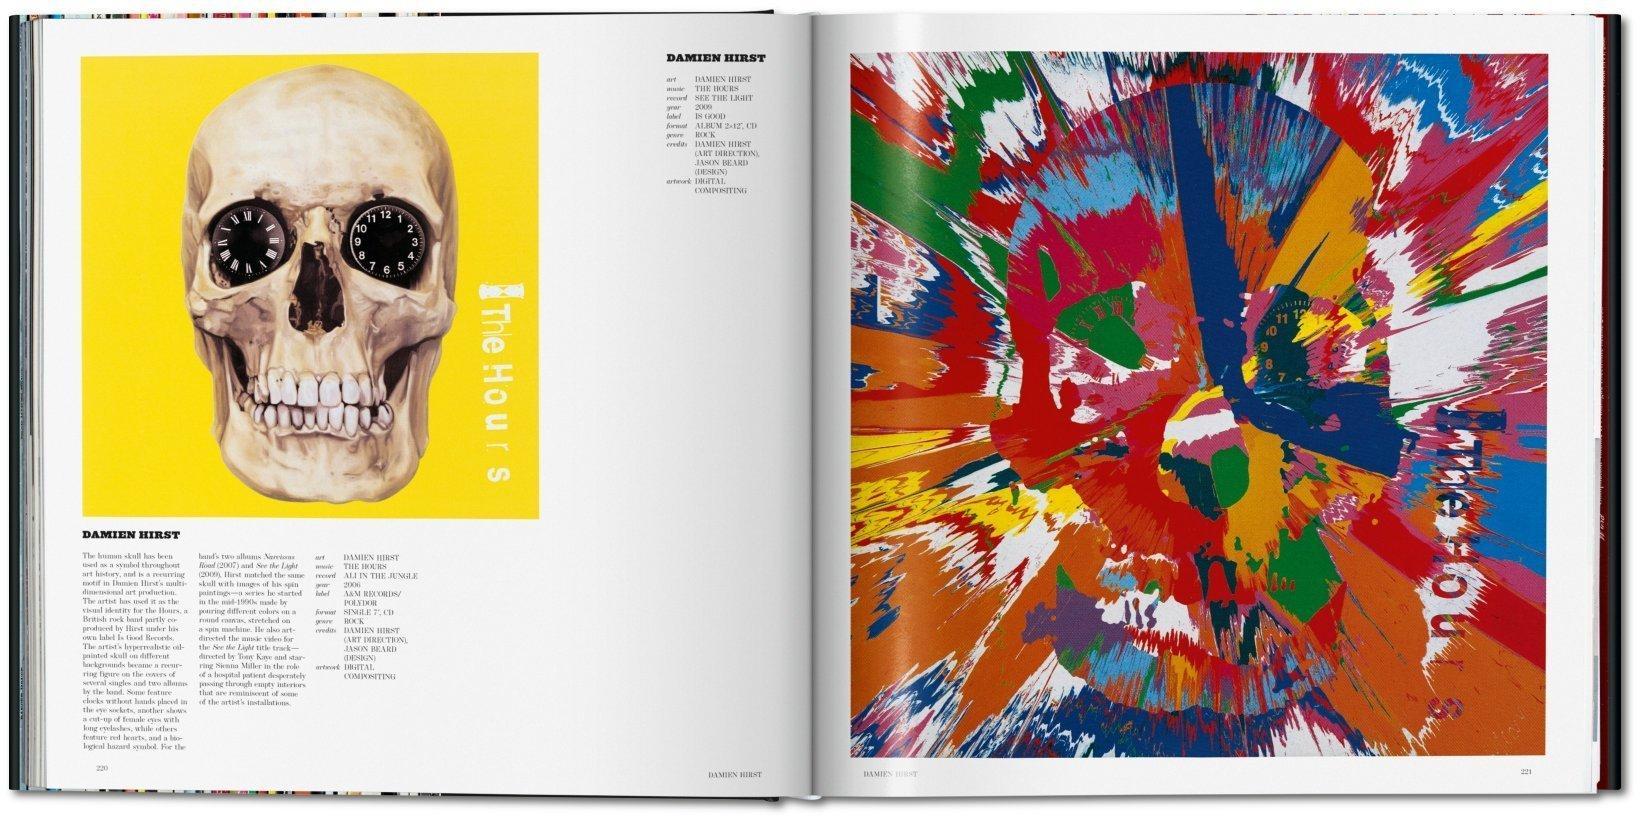 Art-Records-Covers-Francesco-Spampinato-Taschen